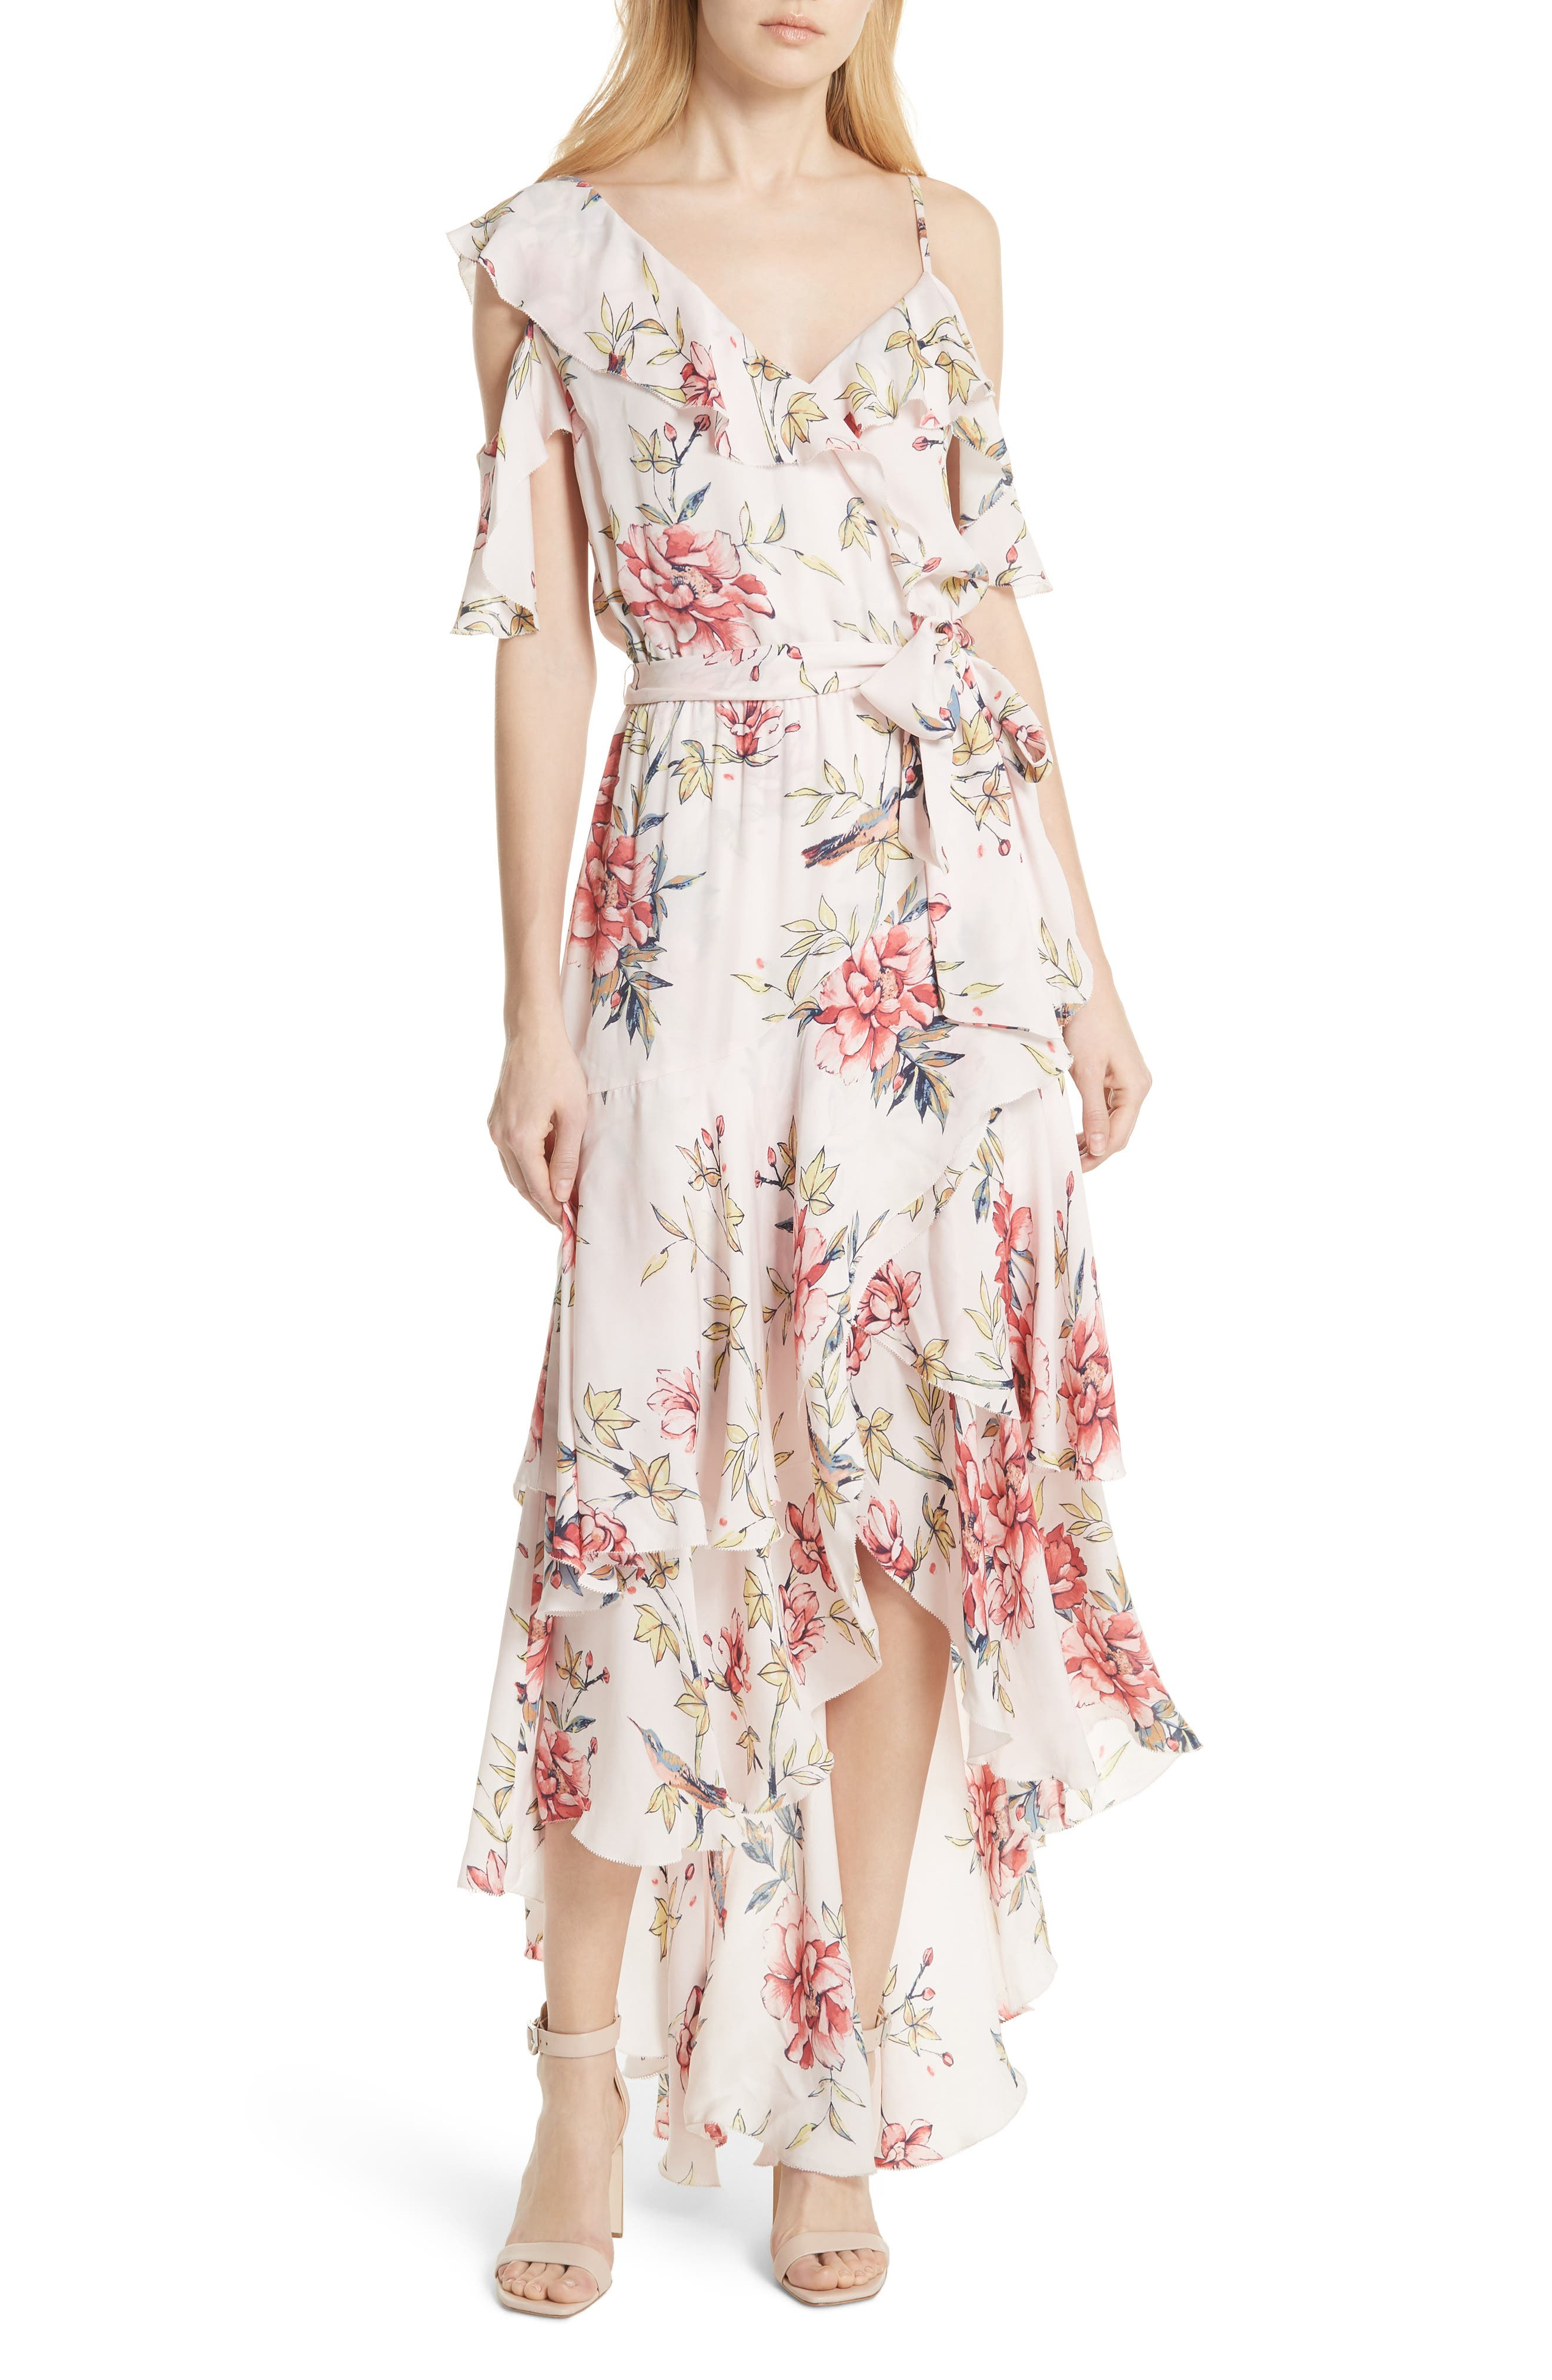 Cristeta Floral Silk Maxi Dress,                             Main thumbnail 1, color,                             680